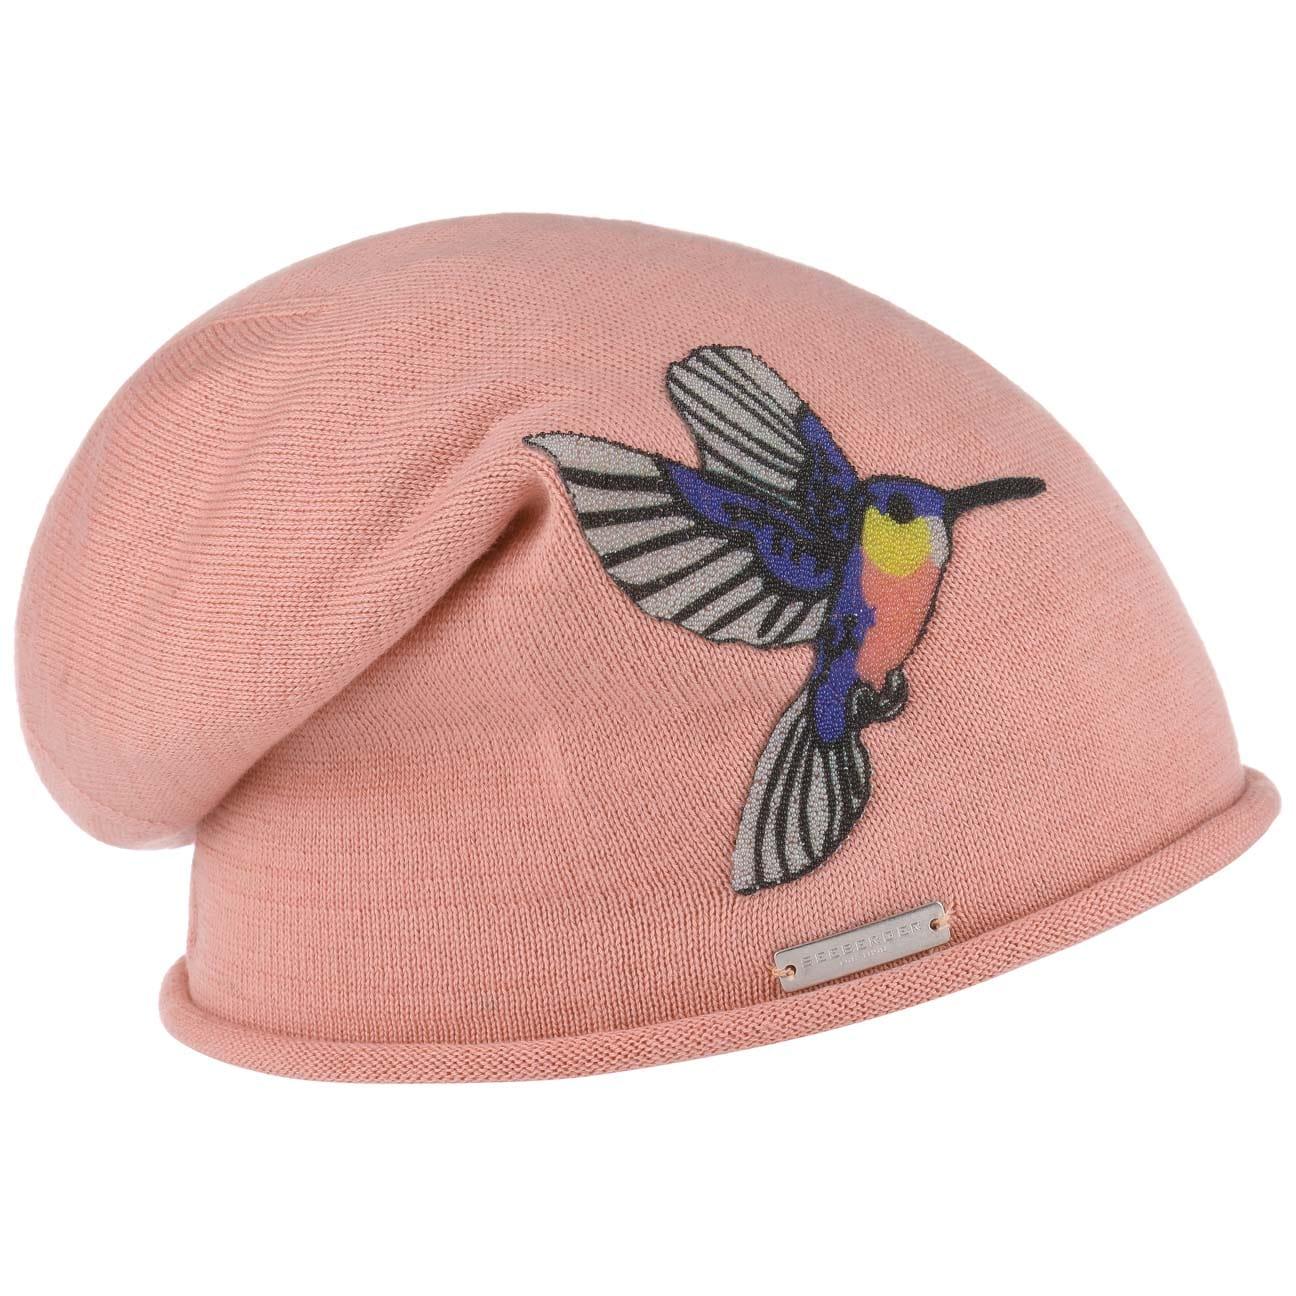 Colibri Headsock Damen Beanie by Seeberger